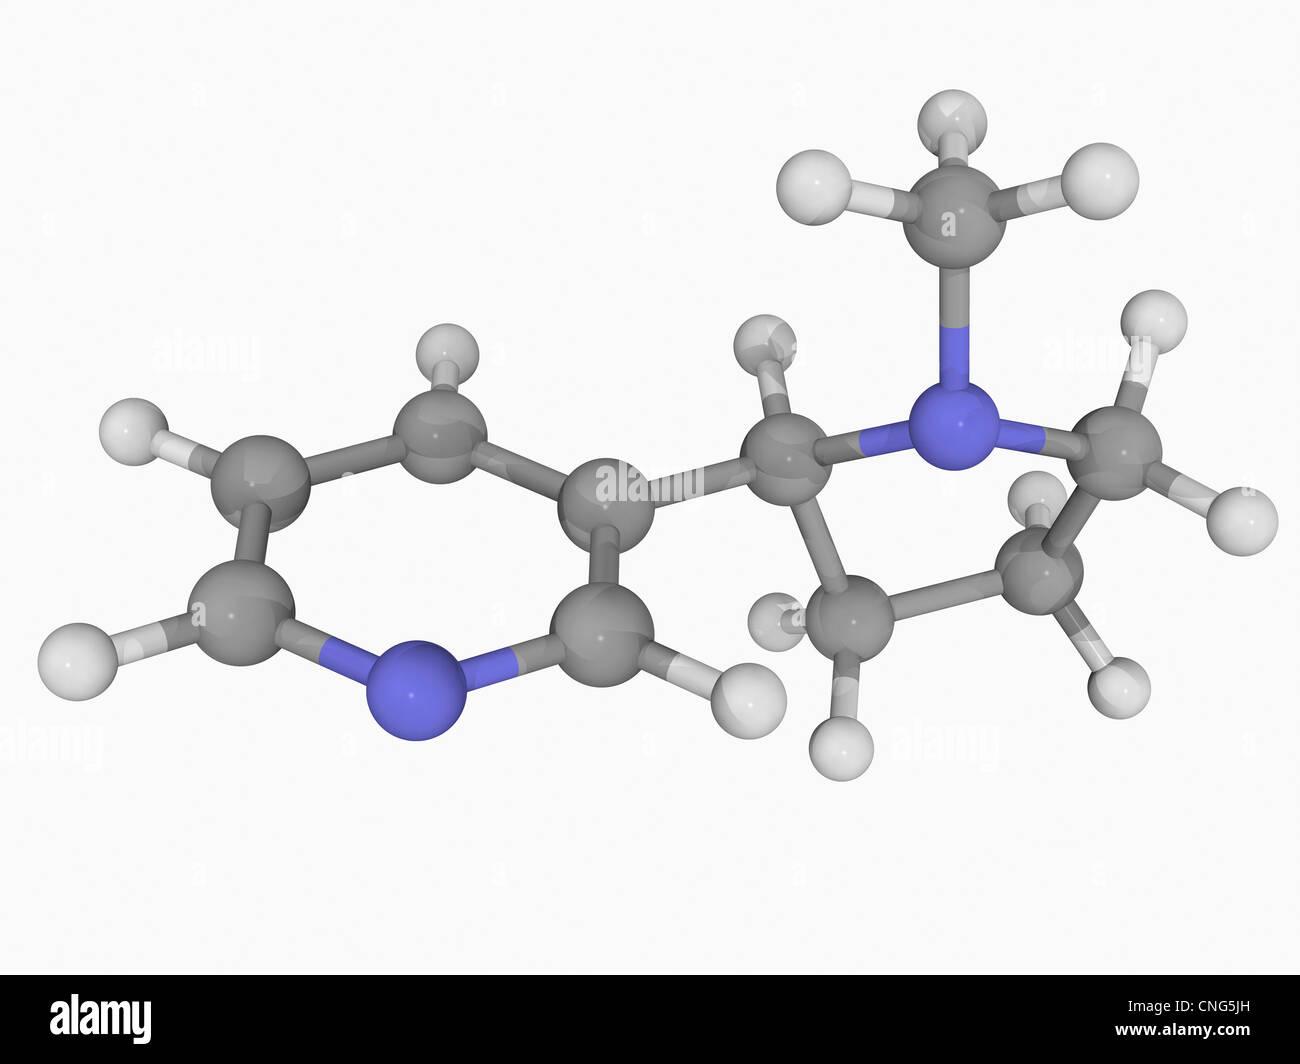 Nicotine molecule - Stock Image